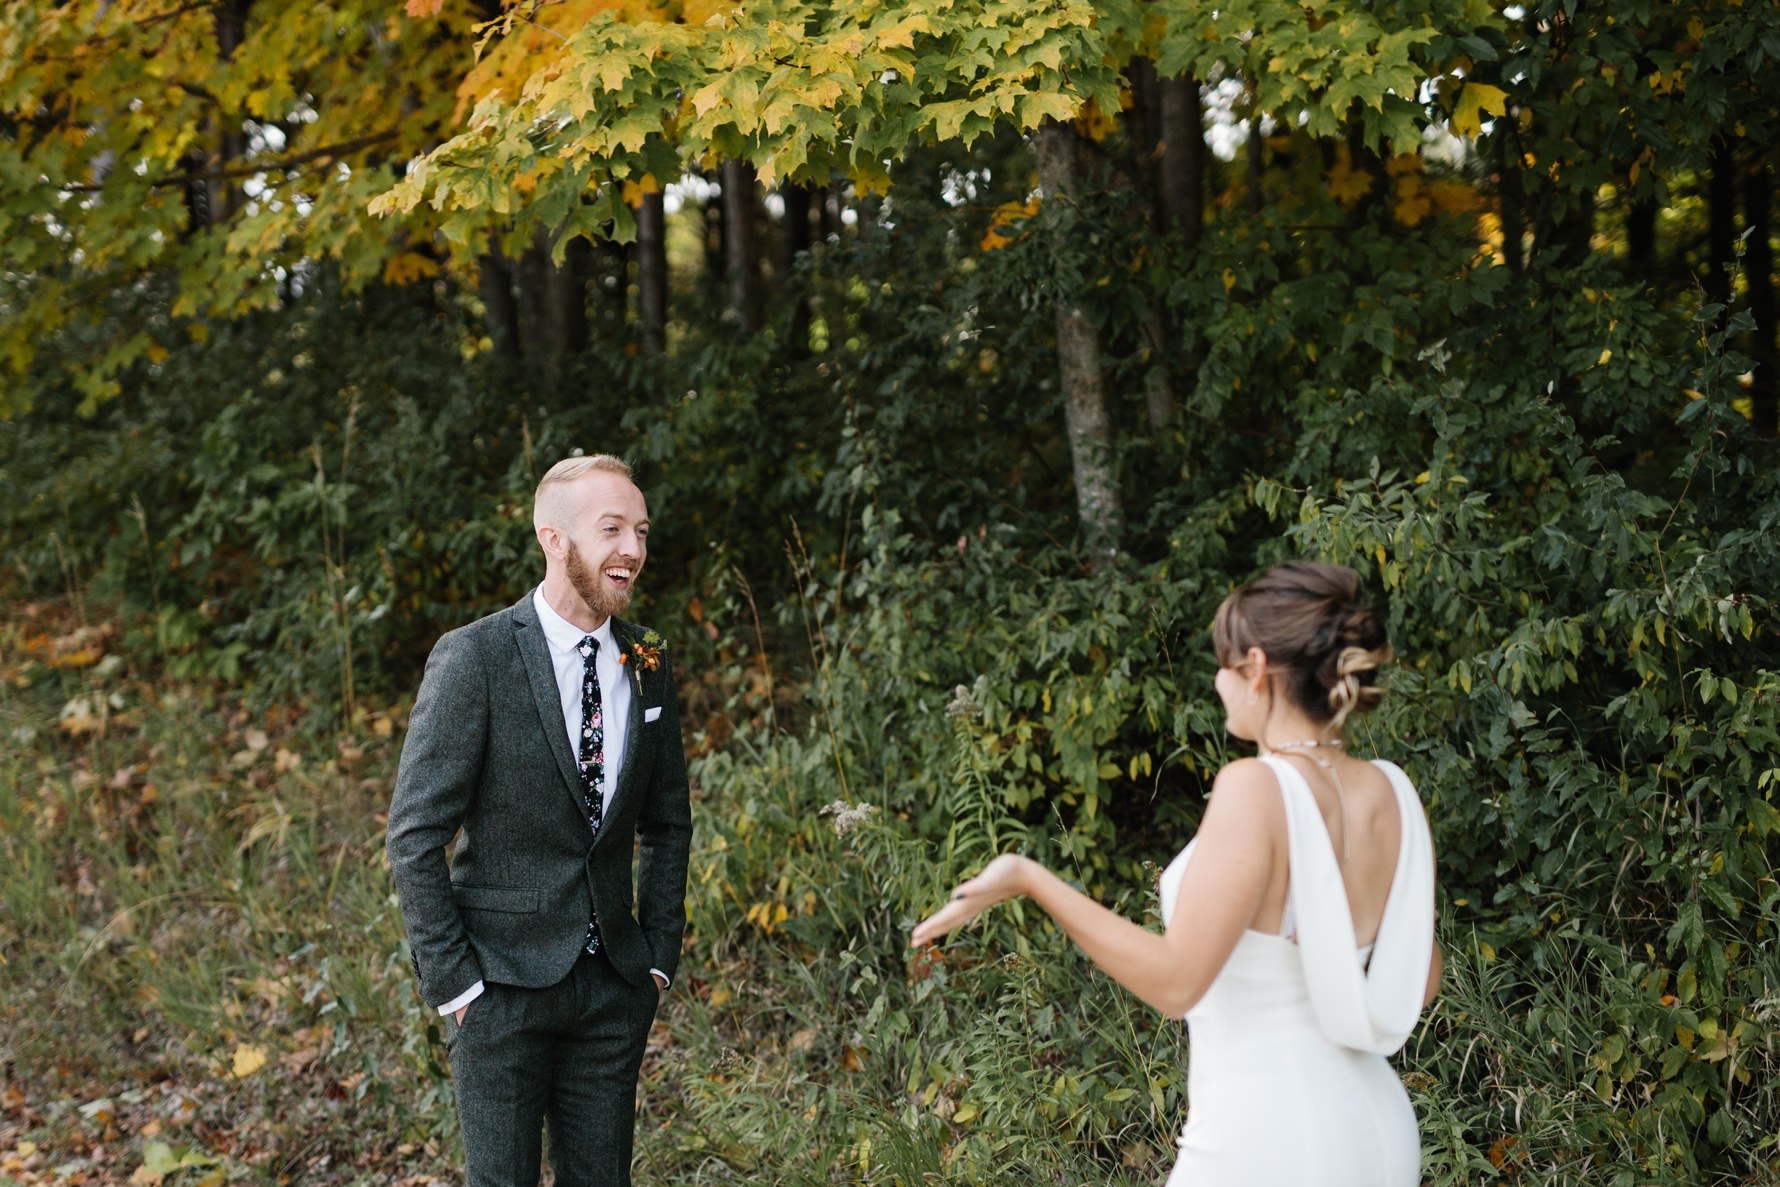 norris-traverse-city-wedding-13.JPG